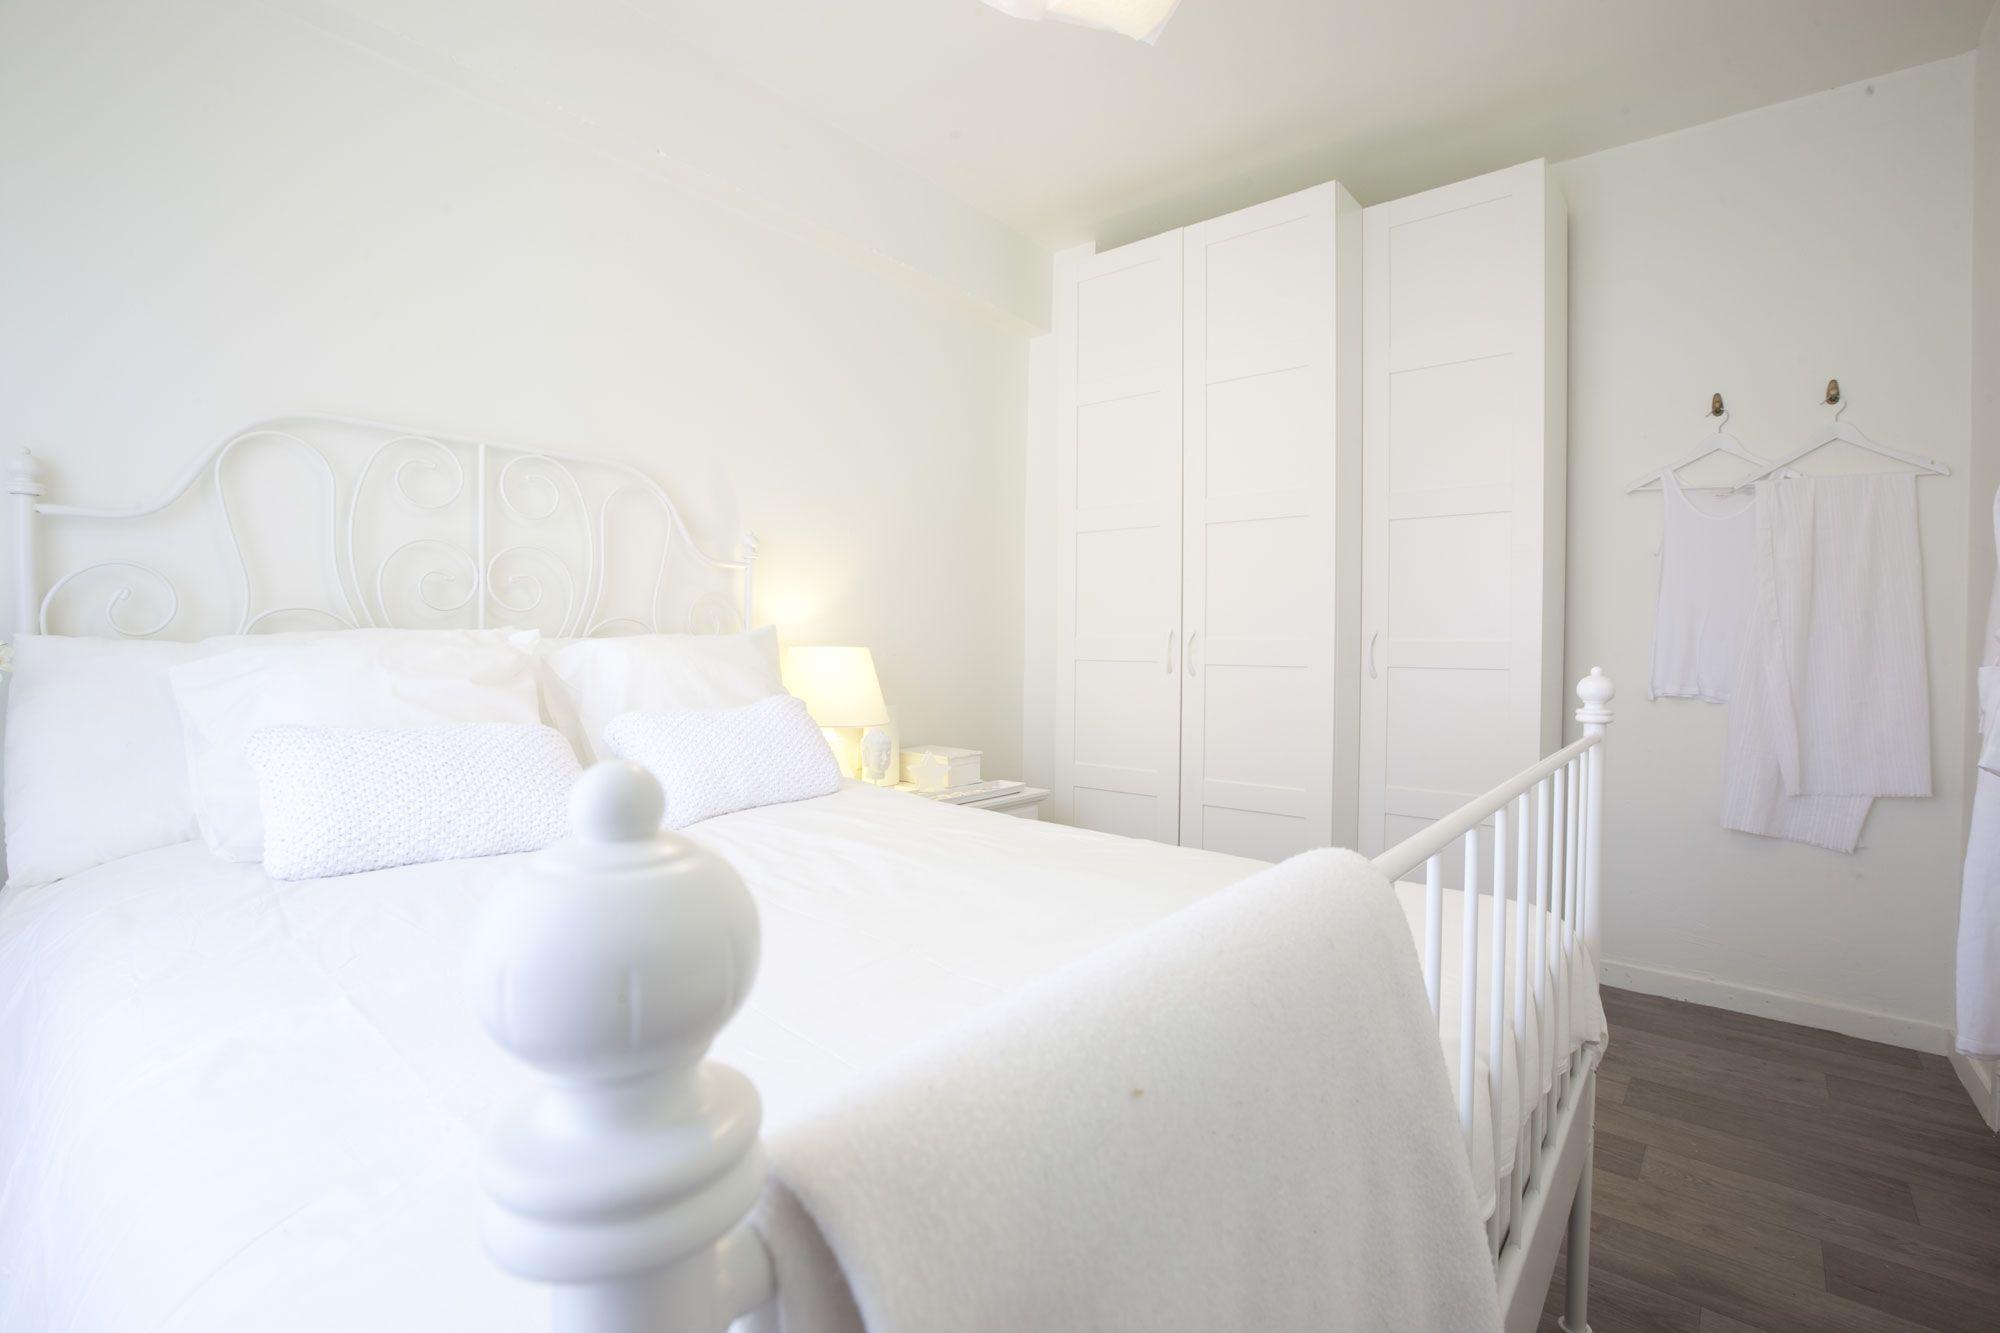 Chambre lumineuse en blanc